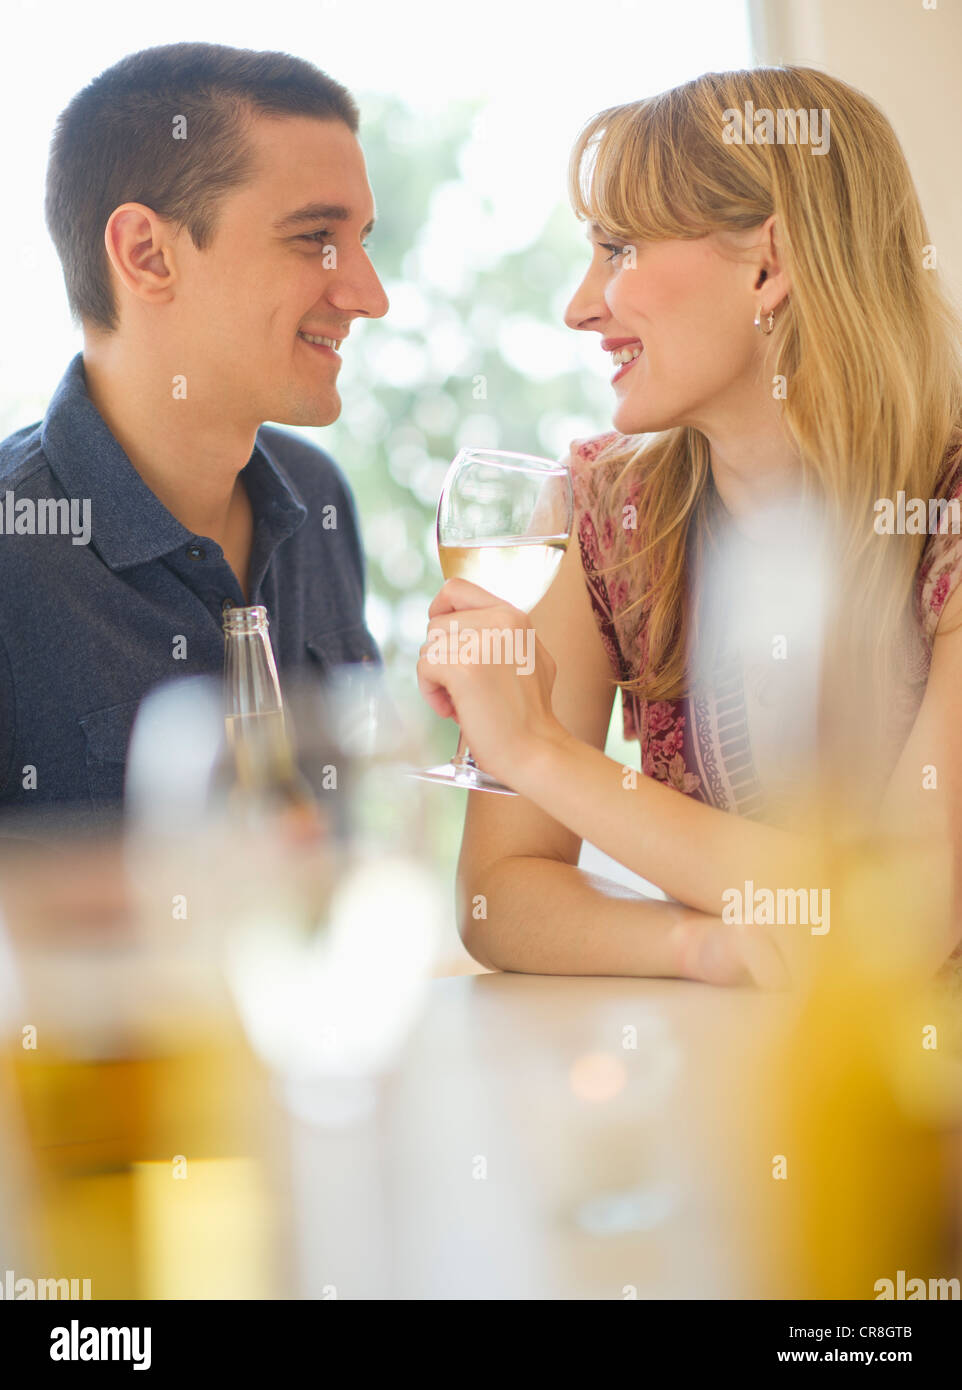 USA, New Jersey, Jersey City, Couple drinking wine - Stock Image